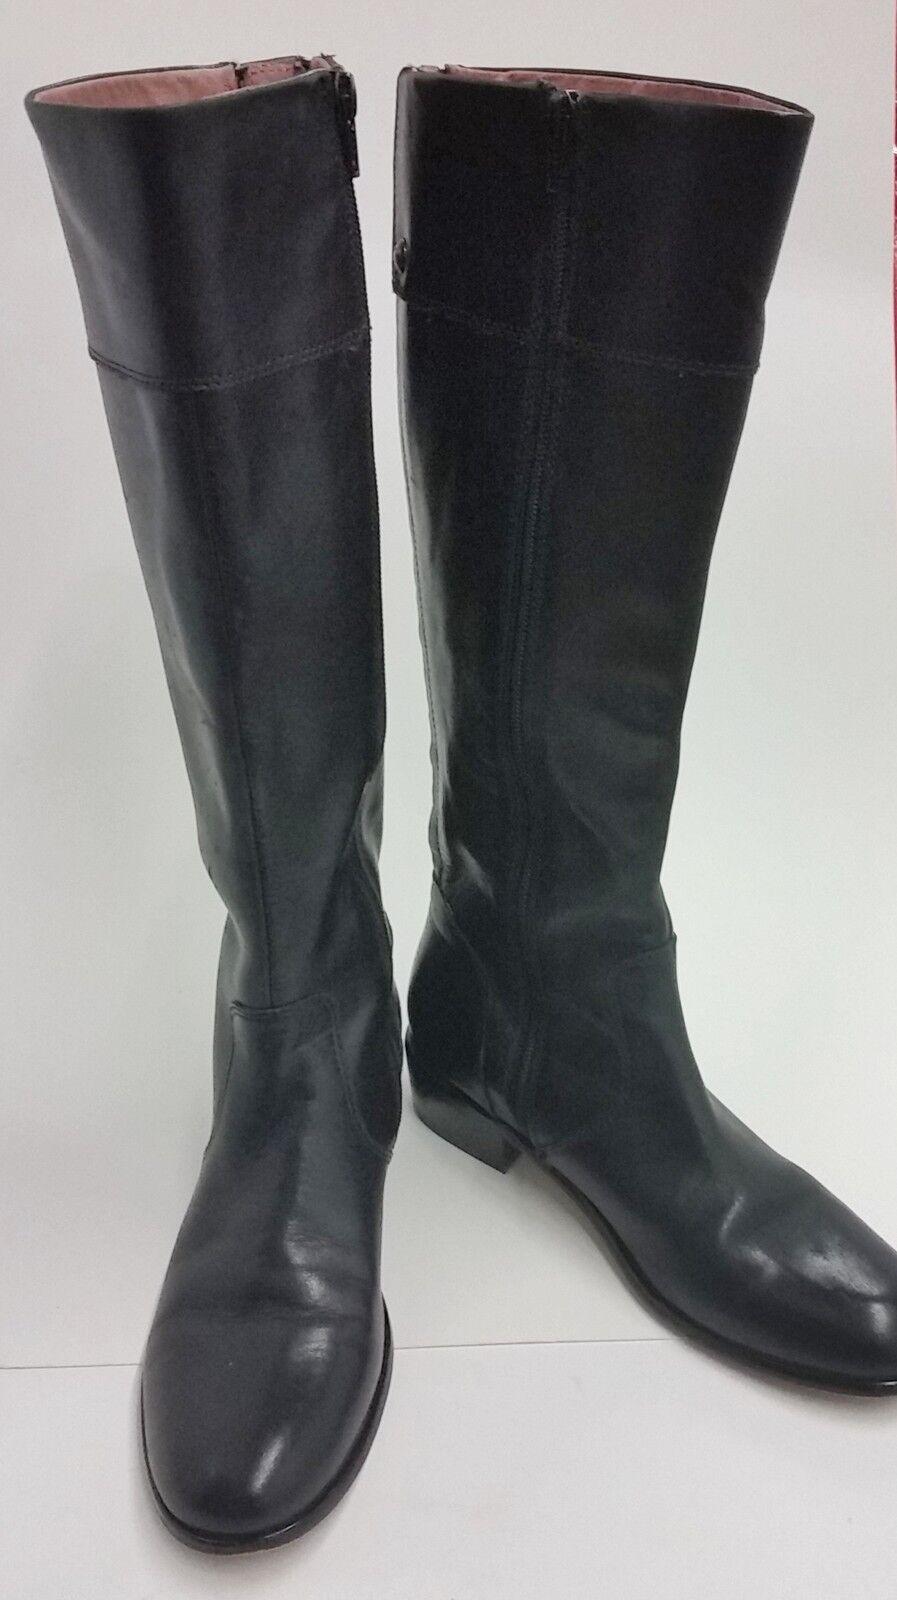 Corso Como Shoes Boots Knee-ni Zipper Elastic  Black Womens Size 6.5 M